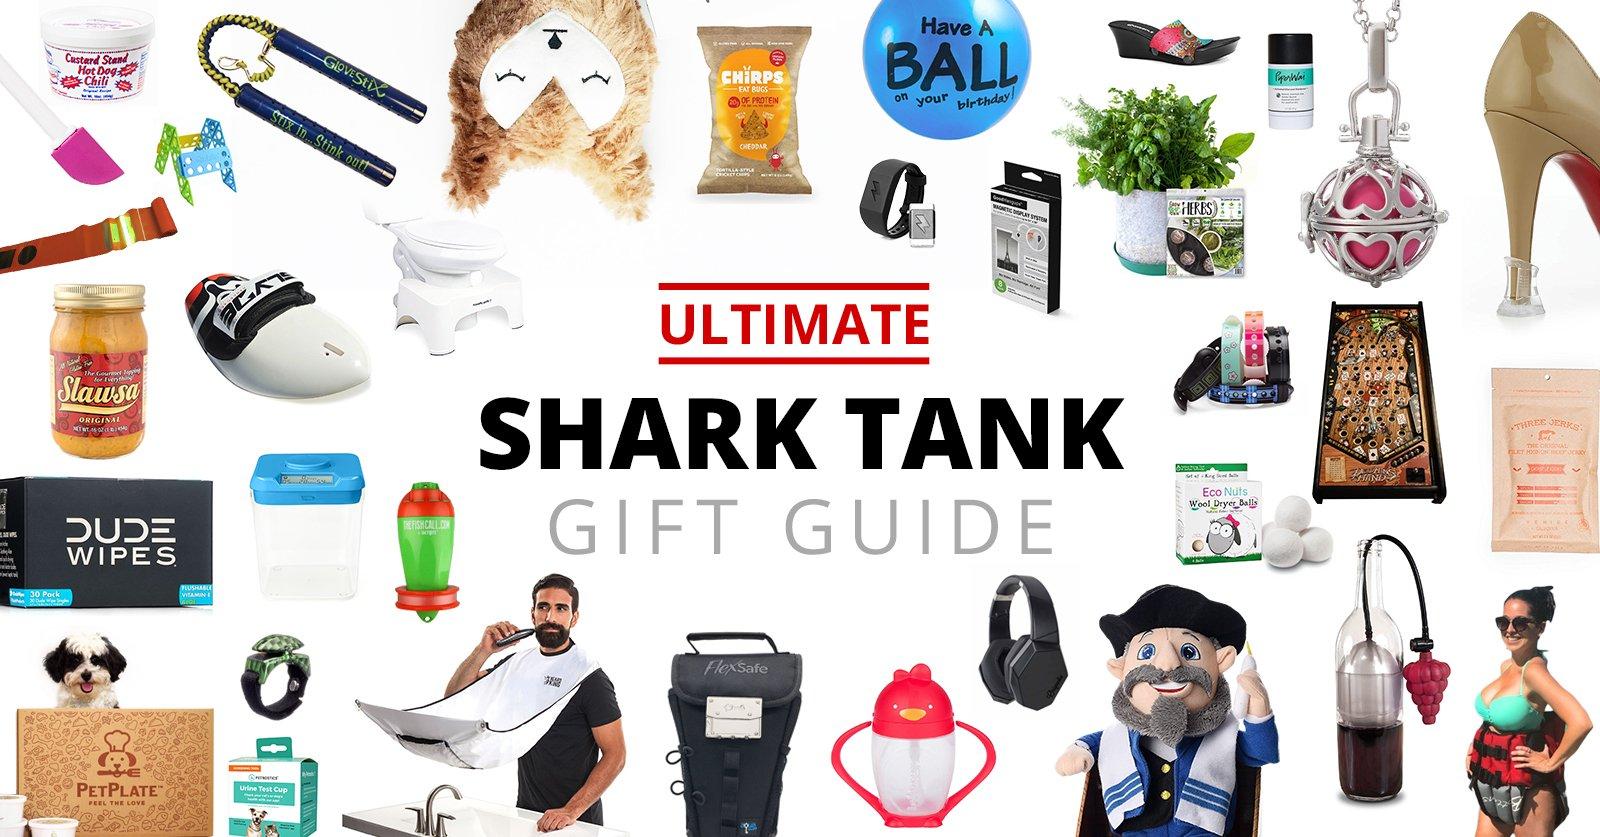 BEARD_KING_Ultimate_Shark_Tank_Holiday_Gift_Guide_01.jpg